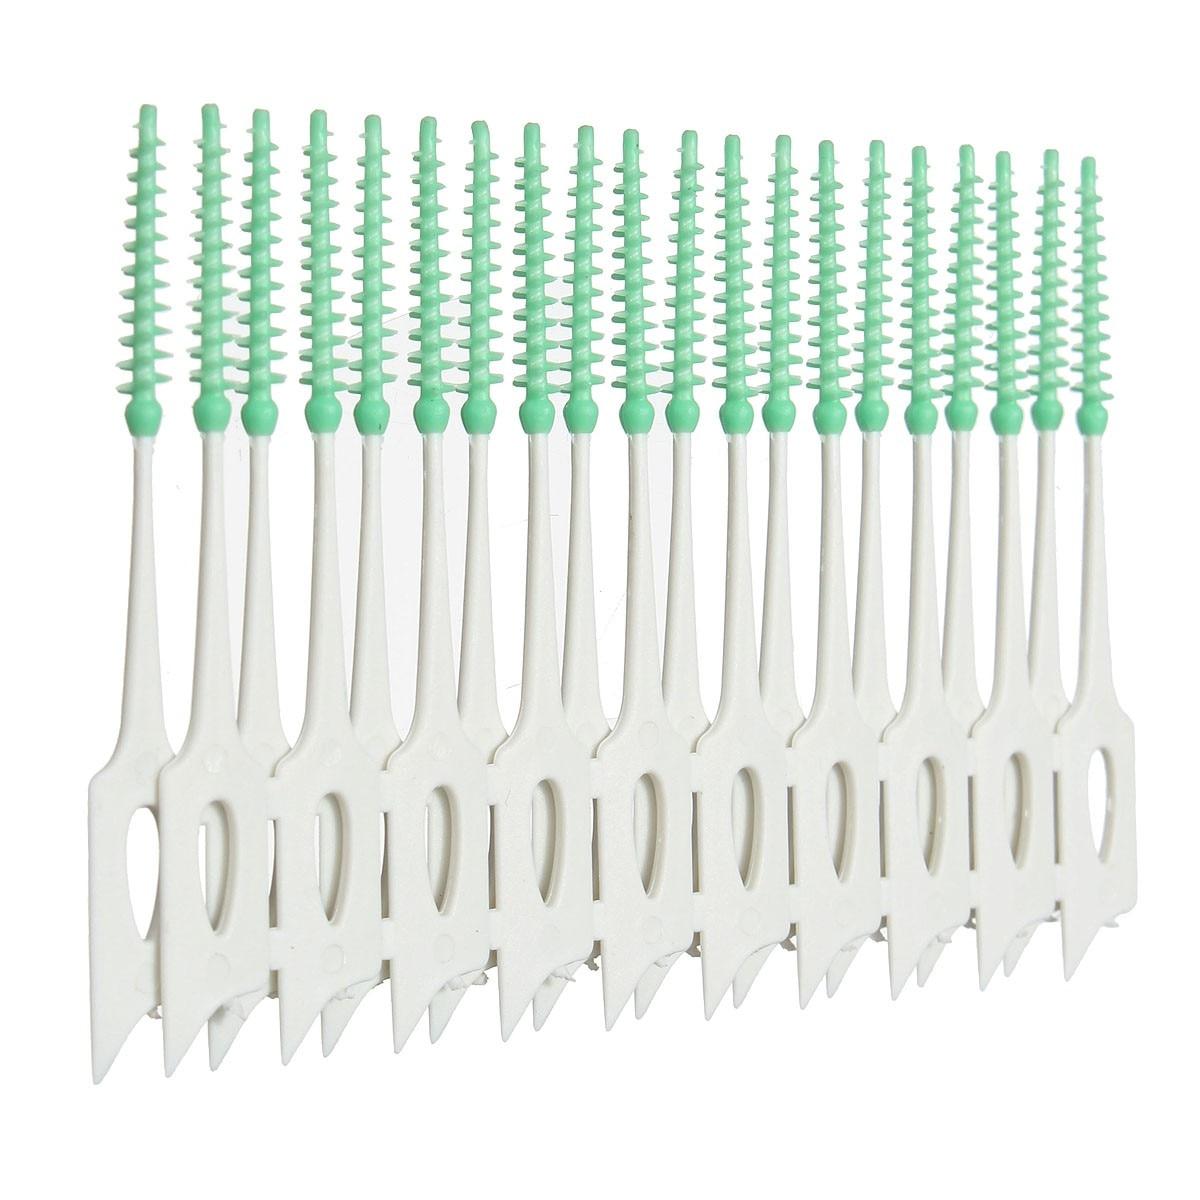 40pcs/pack Plastic Interdental Floss Brushes Soft Dental Toothpick Oral Hygiene Teeth Cleaning Tool Elastic Massage Gums